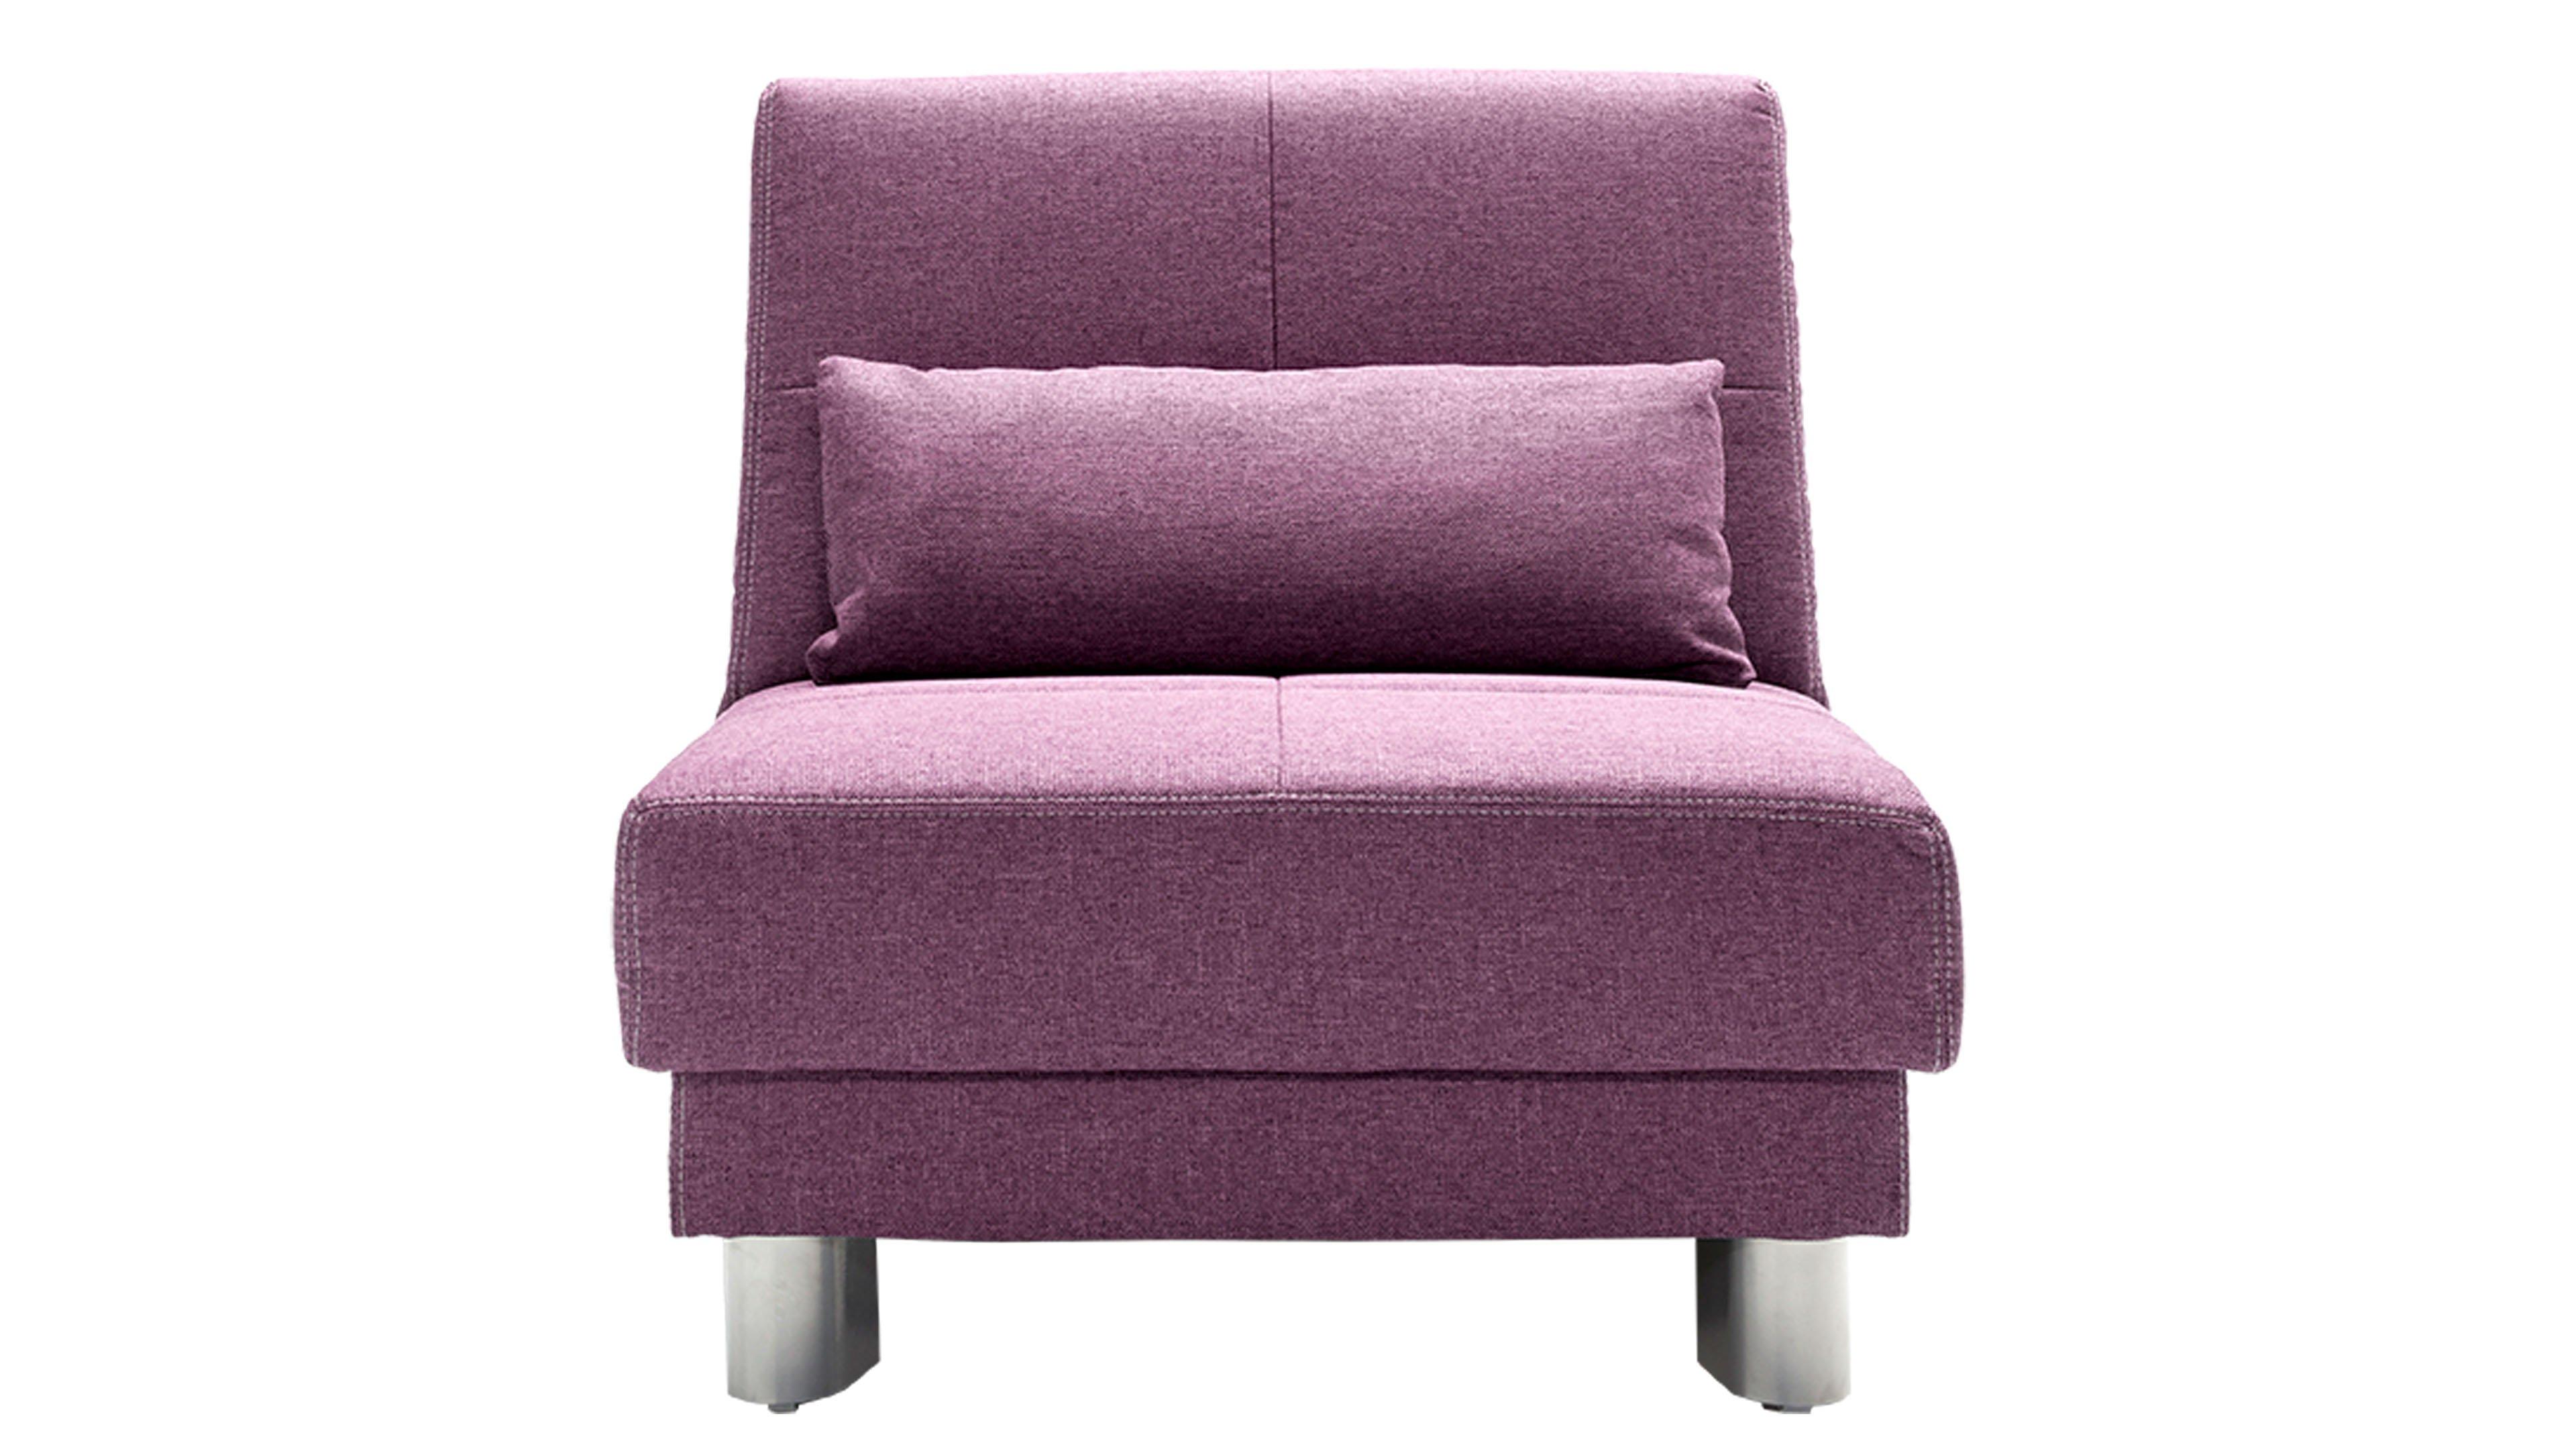 Schlafsofa Gina Bezug Enjoy 15 purple Füße Metall alufarben